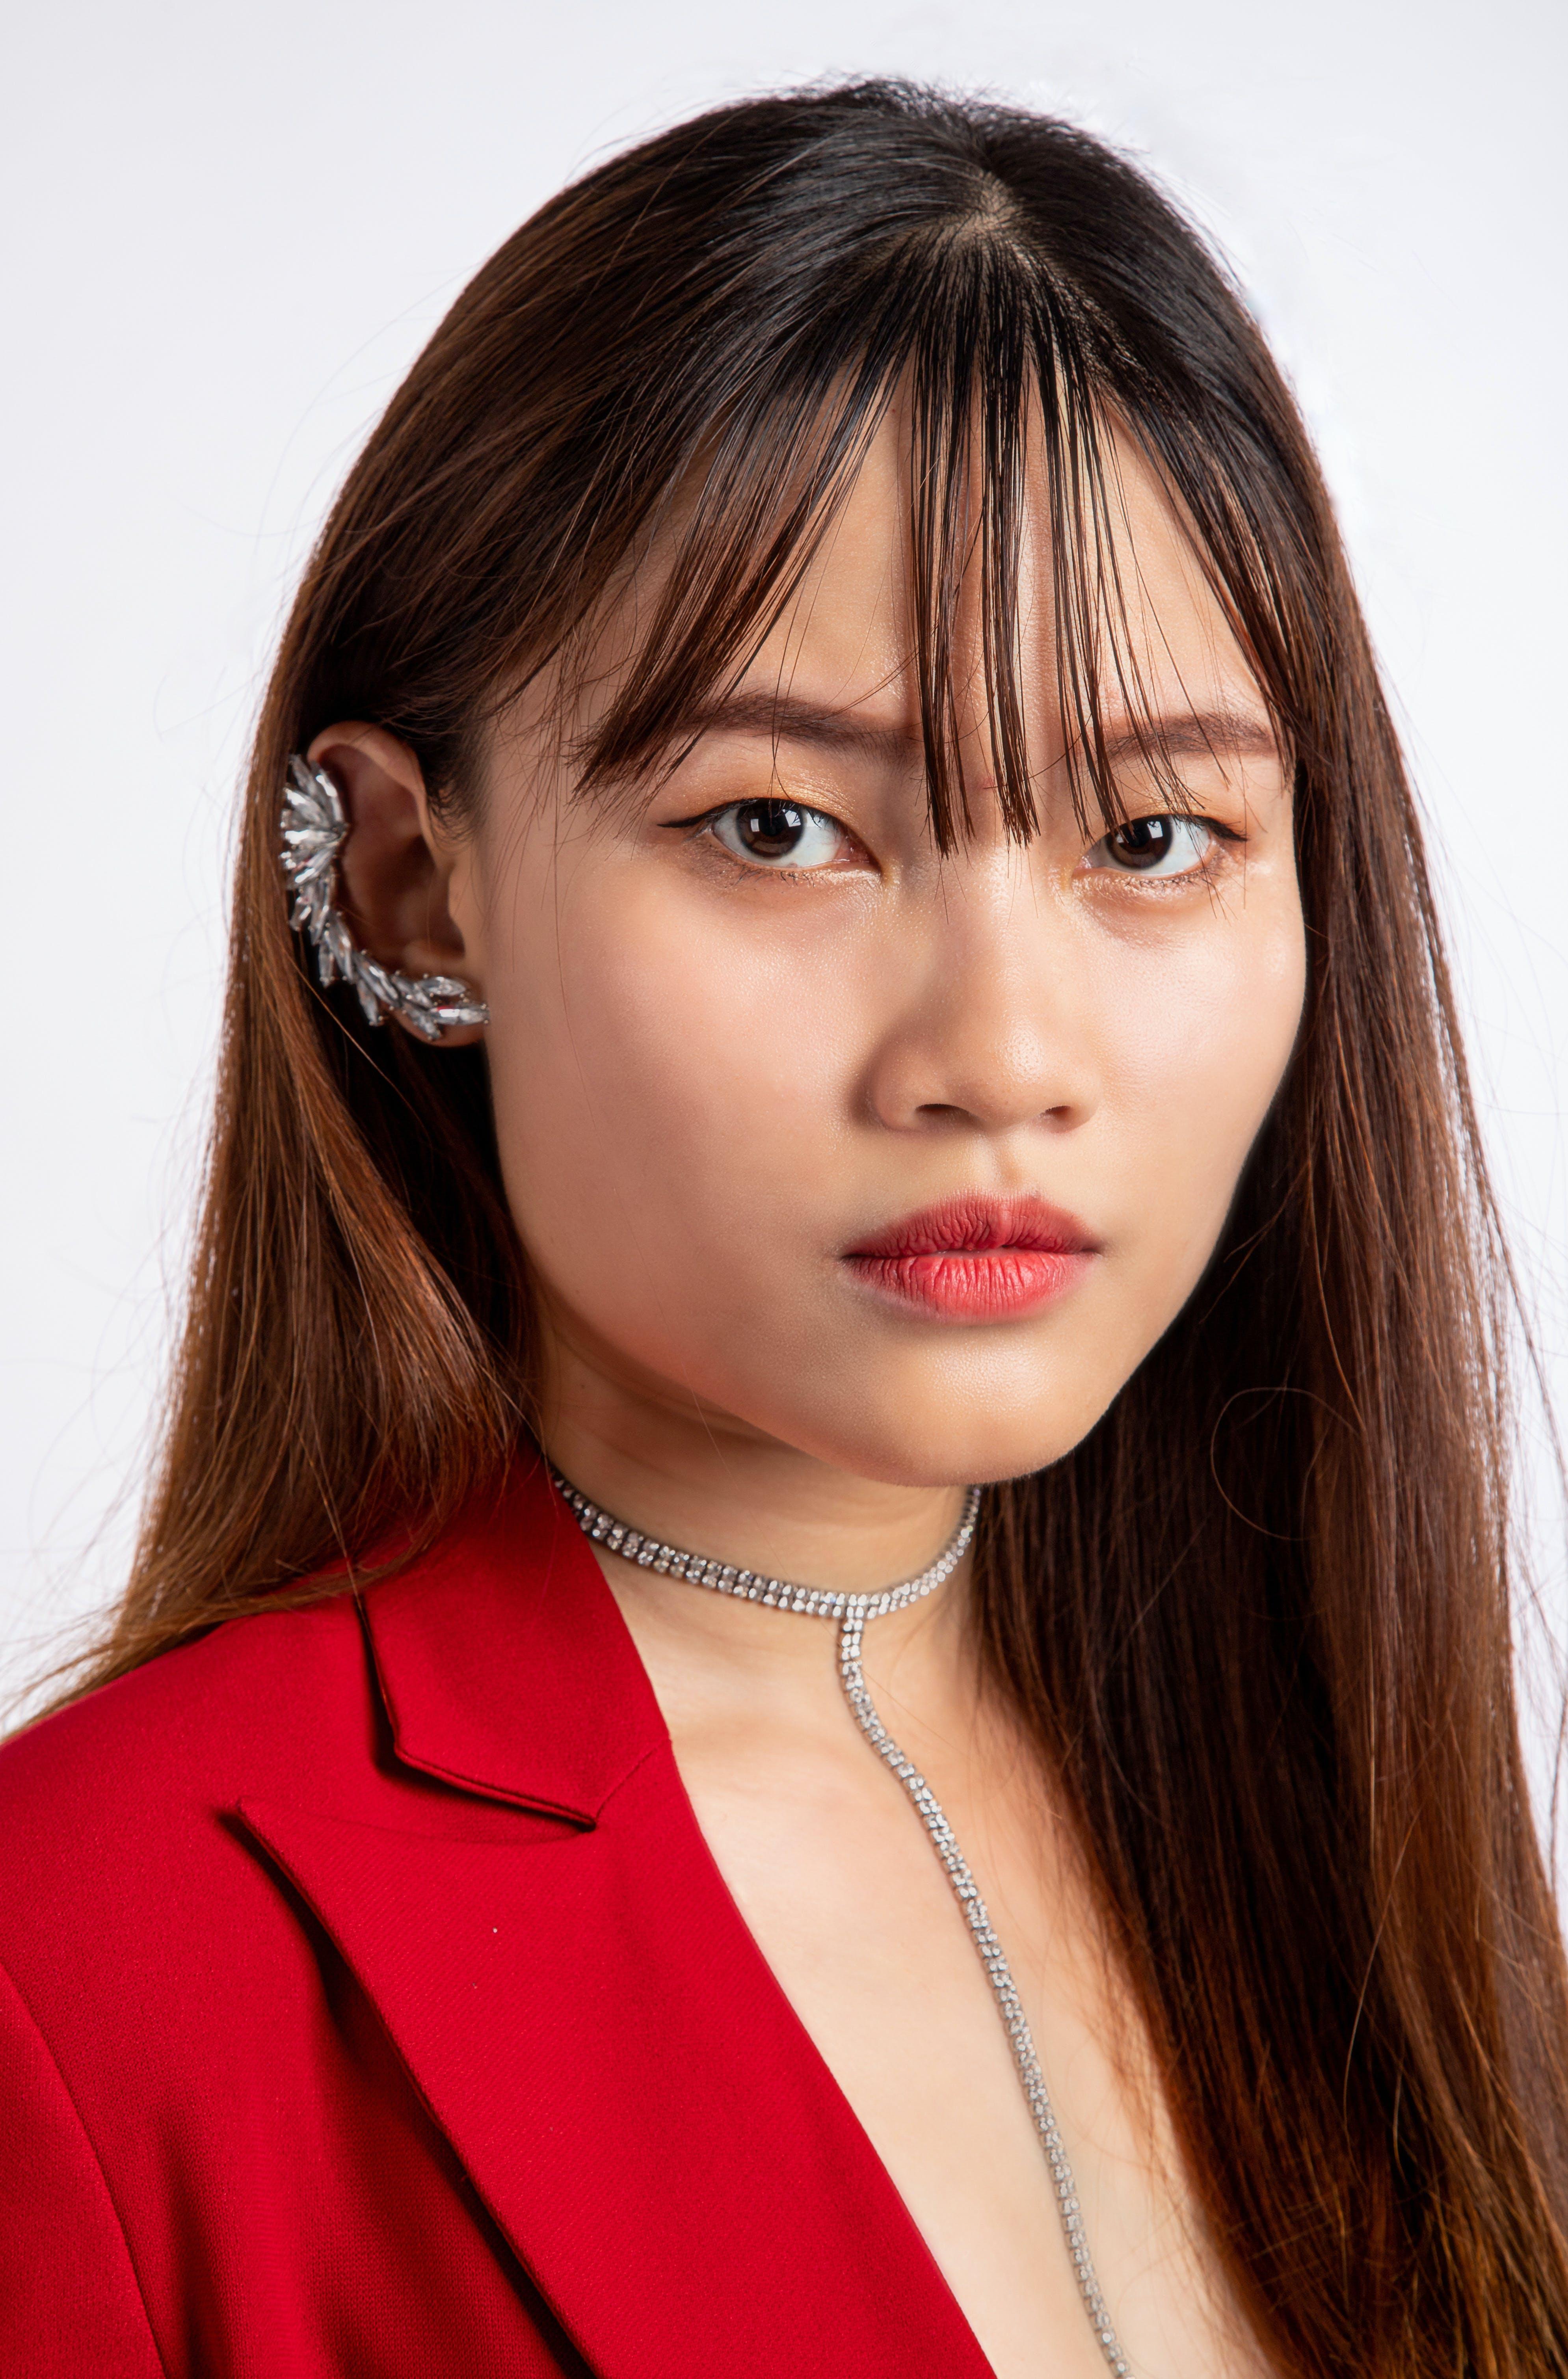 Fotos de stock gratuitas de actitud, asiática, atractivo, belleza